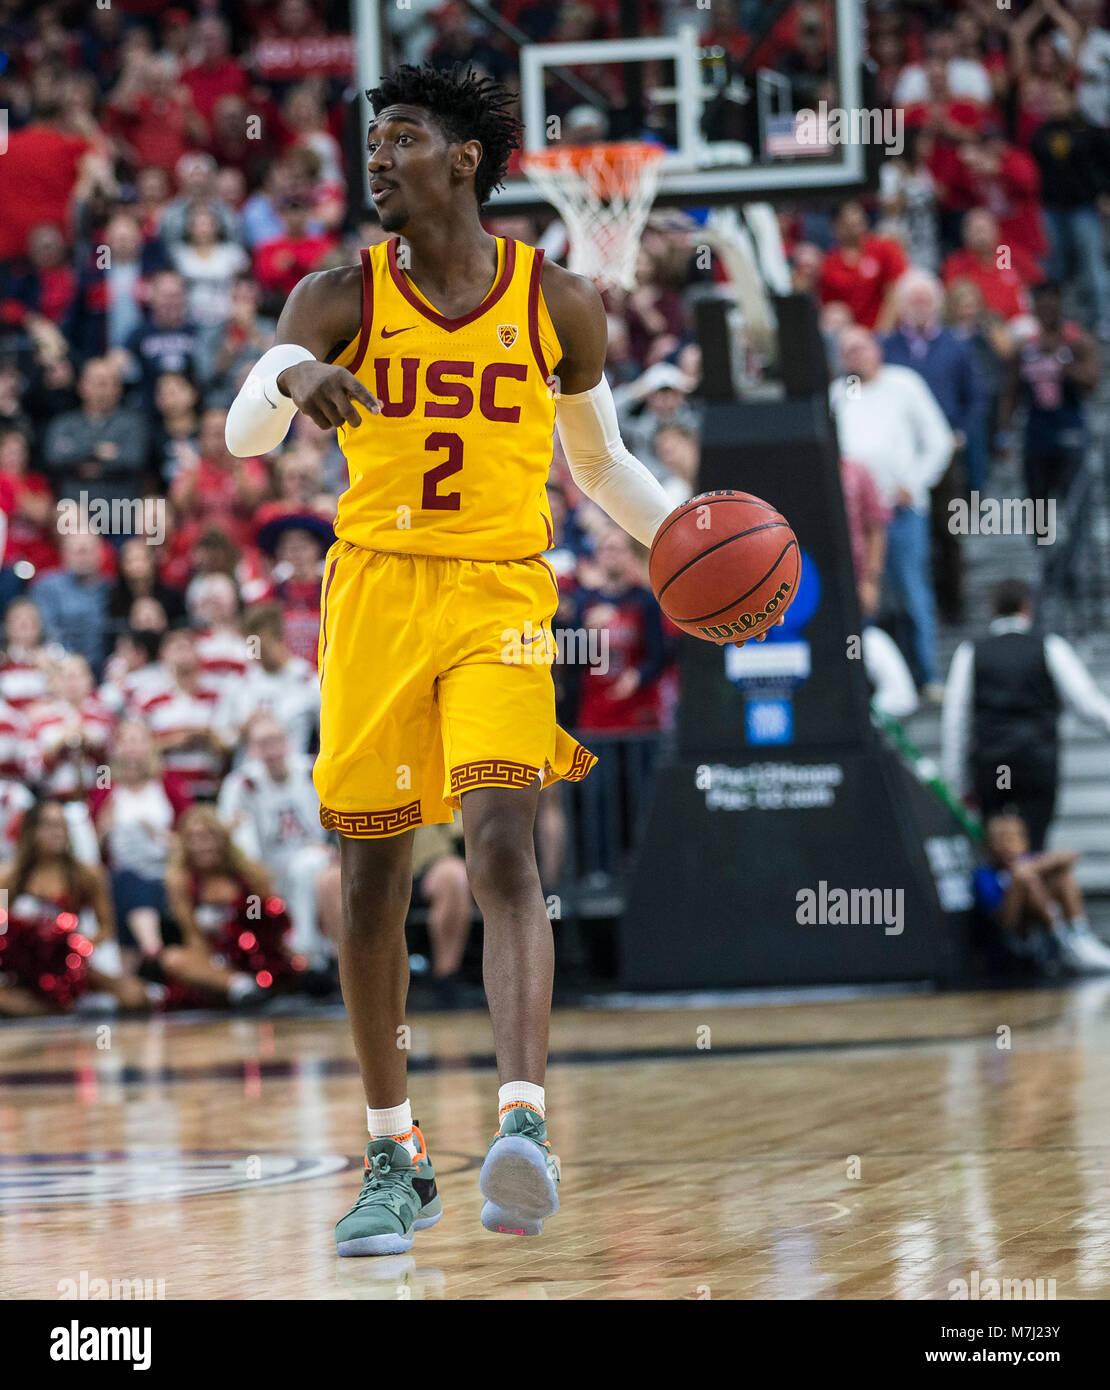 Mar 10 2018 Las Vegas NV USA USC Guard Jonah Mathews 2 Scored 11 Points Set Up Trojans Offense During The NCAA Pac 12 Mens Basketball Championship